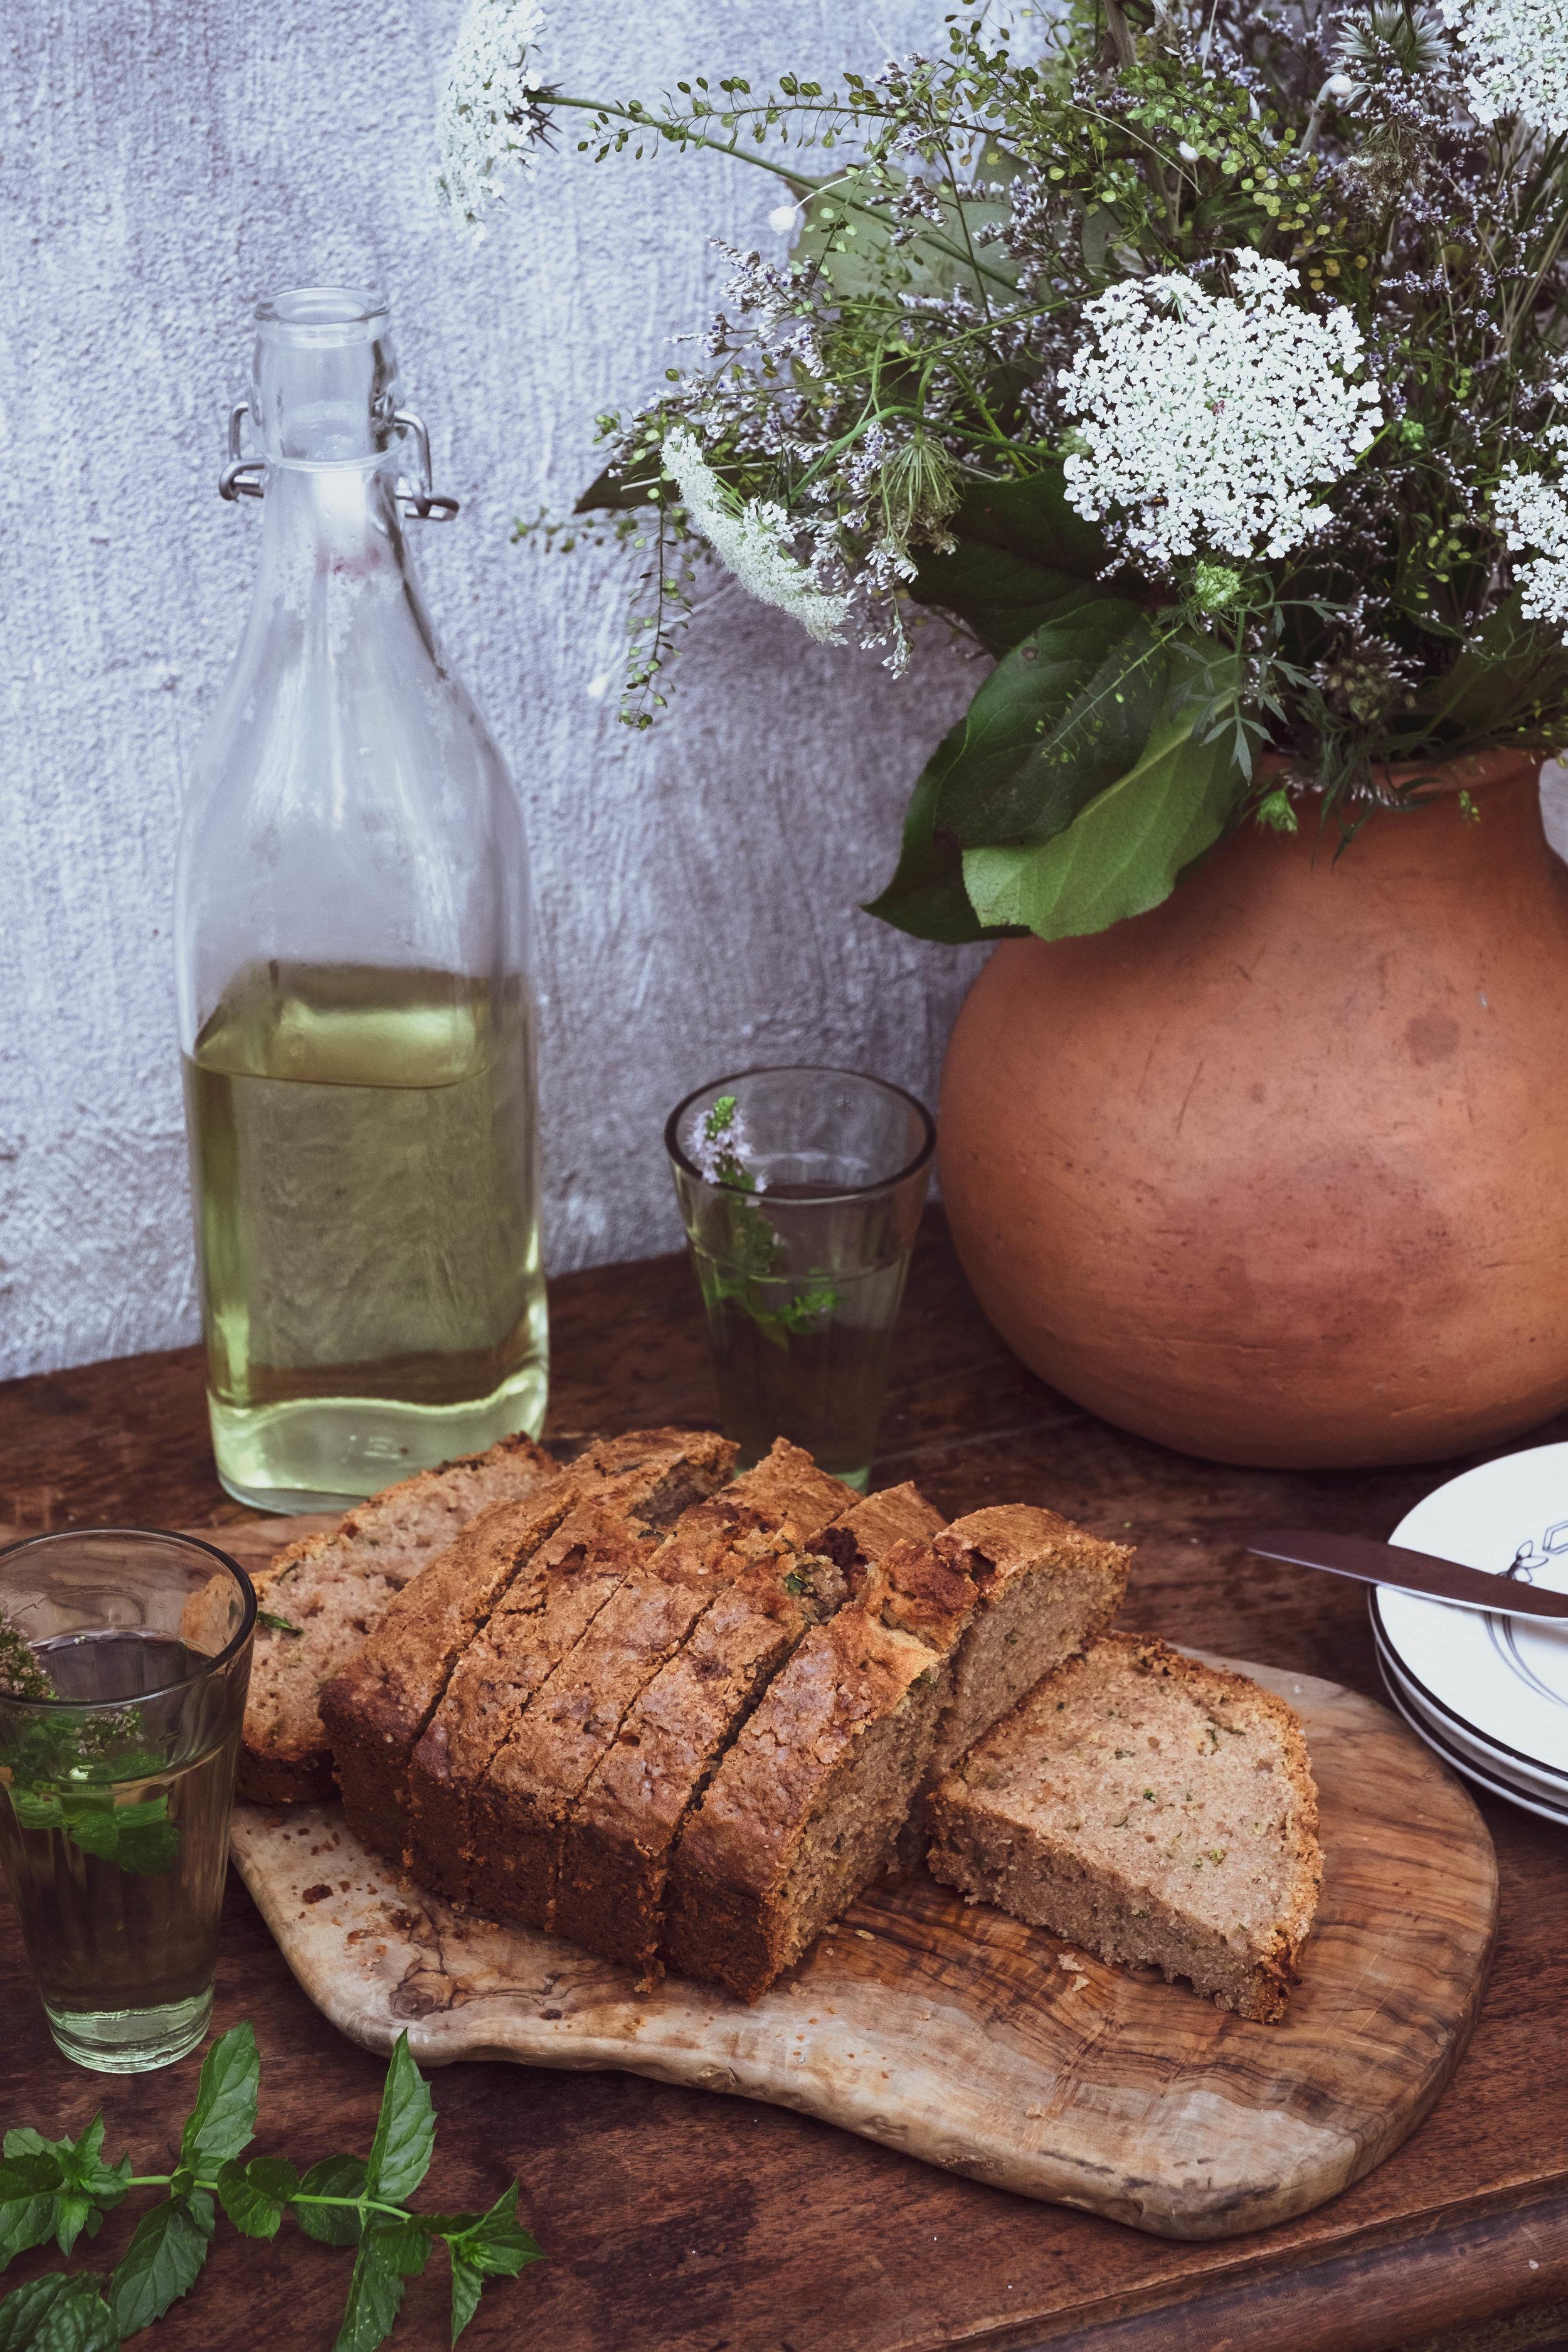 ROSE & IVY At the Market Zucchini + Zucchini Bread